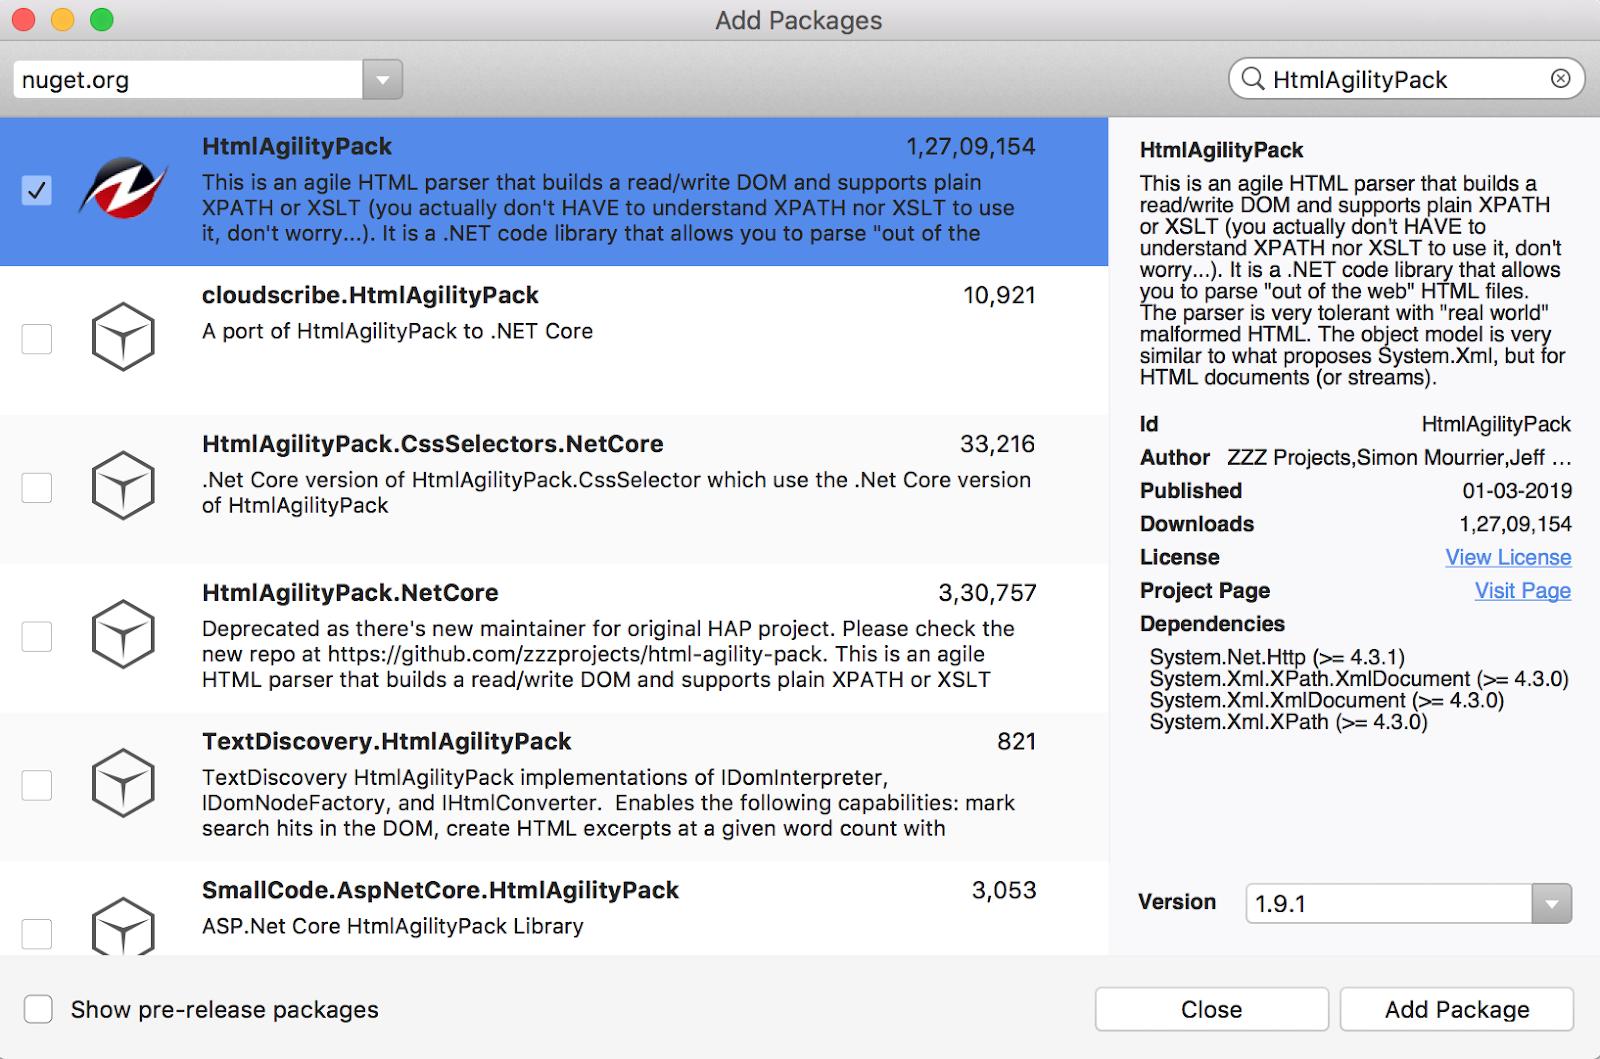 HtmlAgilityPack: Html parsing in Xamarin Forms (C# - Xaml